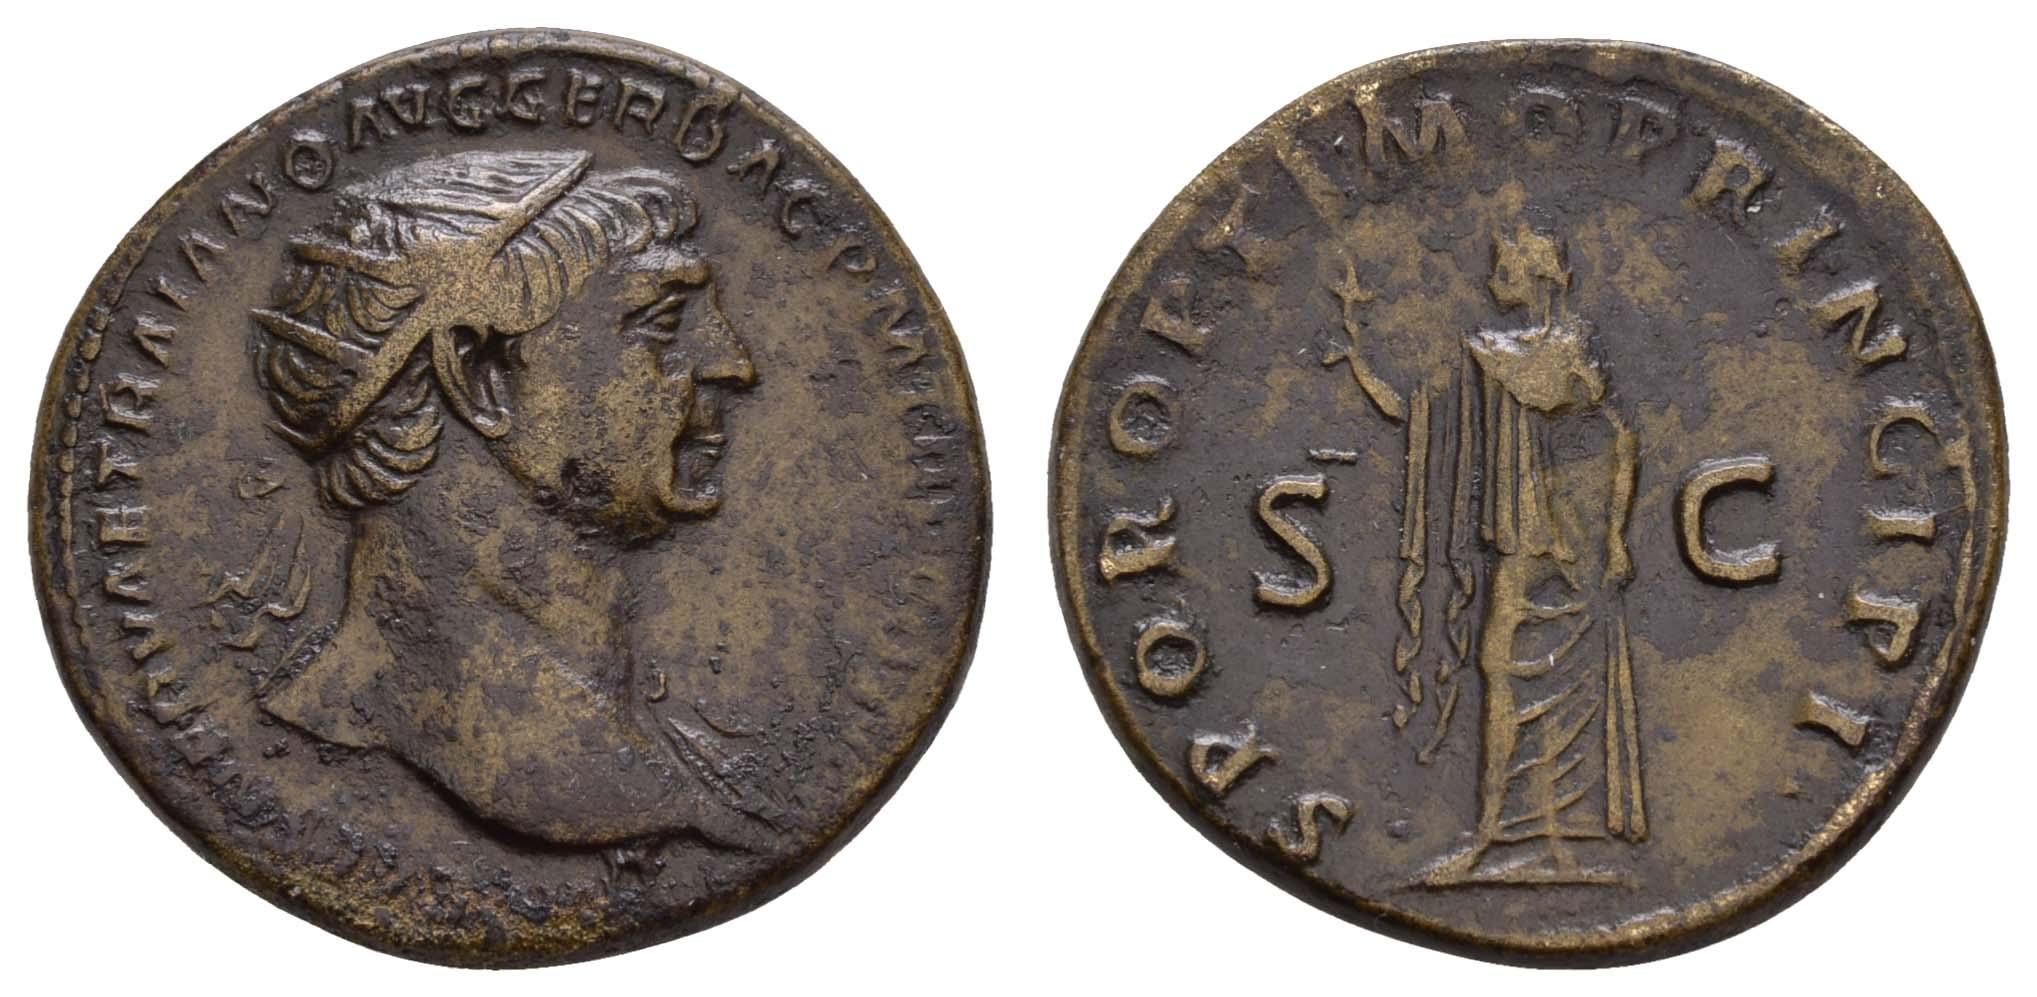 Lot 161 - Antike Römer - Kaiserzeit -  Auktionshaus Ulrich Felzmann GmbH & Co. KG Coins single lots